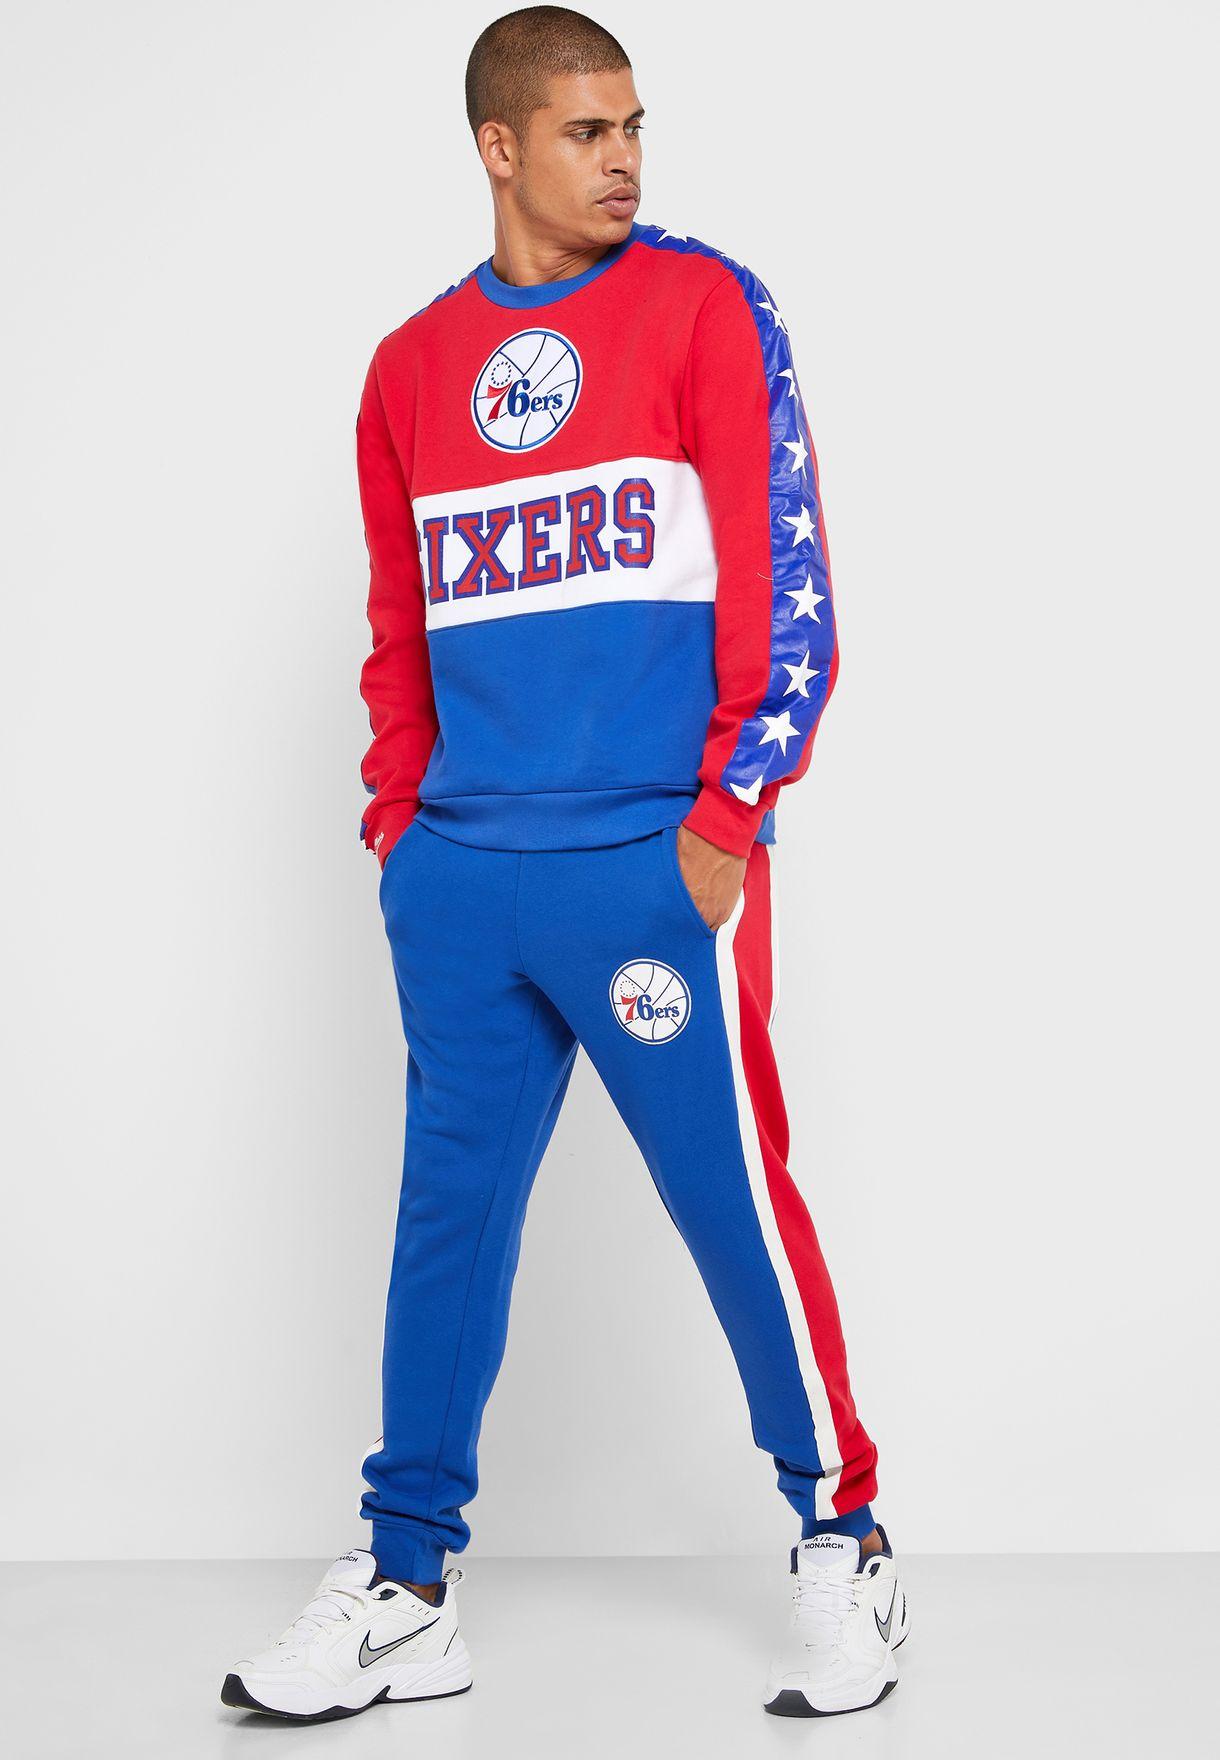 Philadelphia 76Ers Leading Scorer Sweatshirt